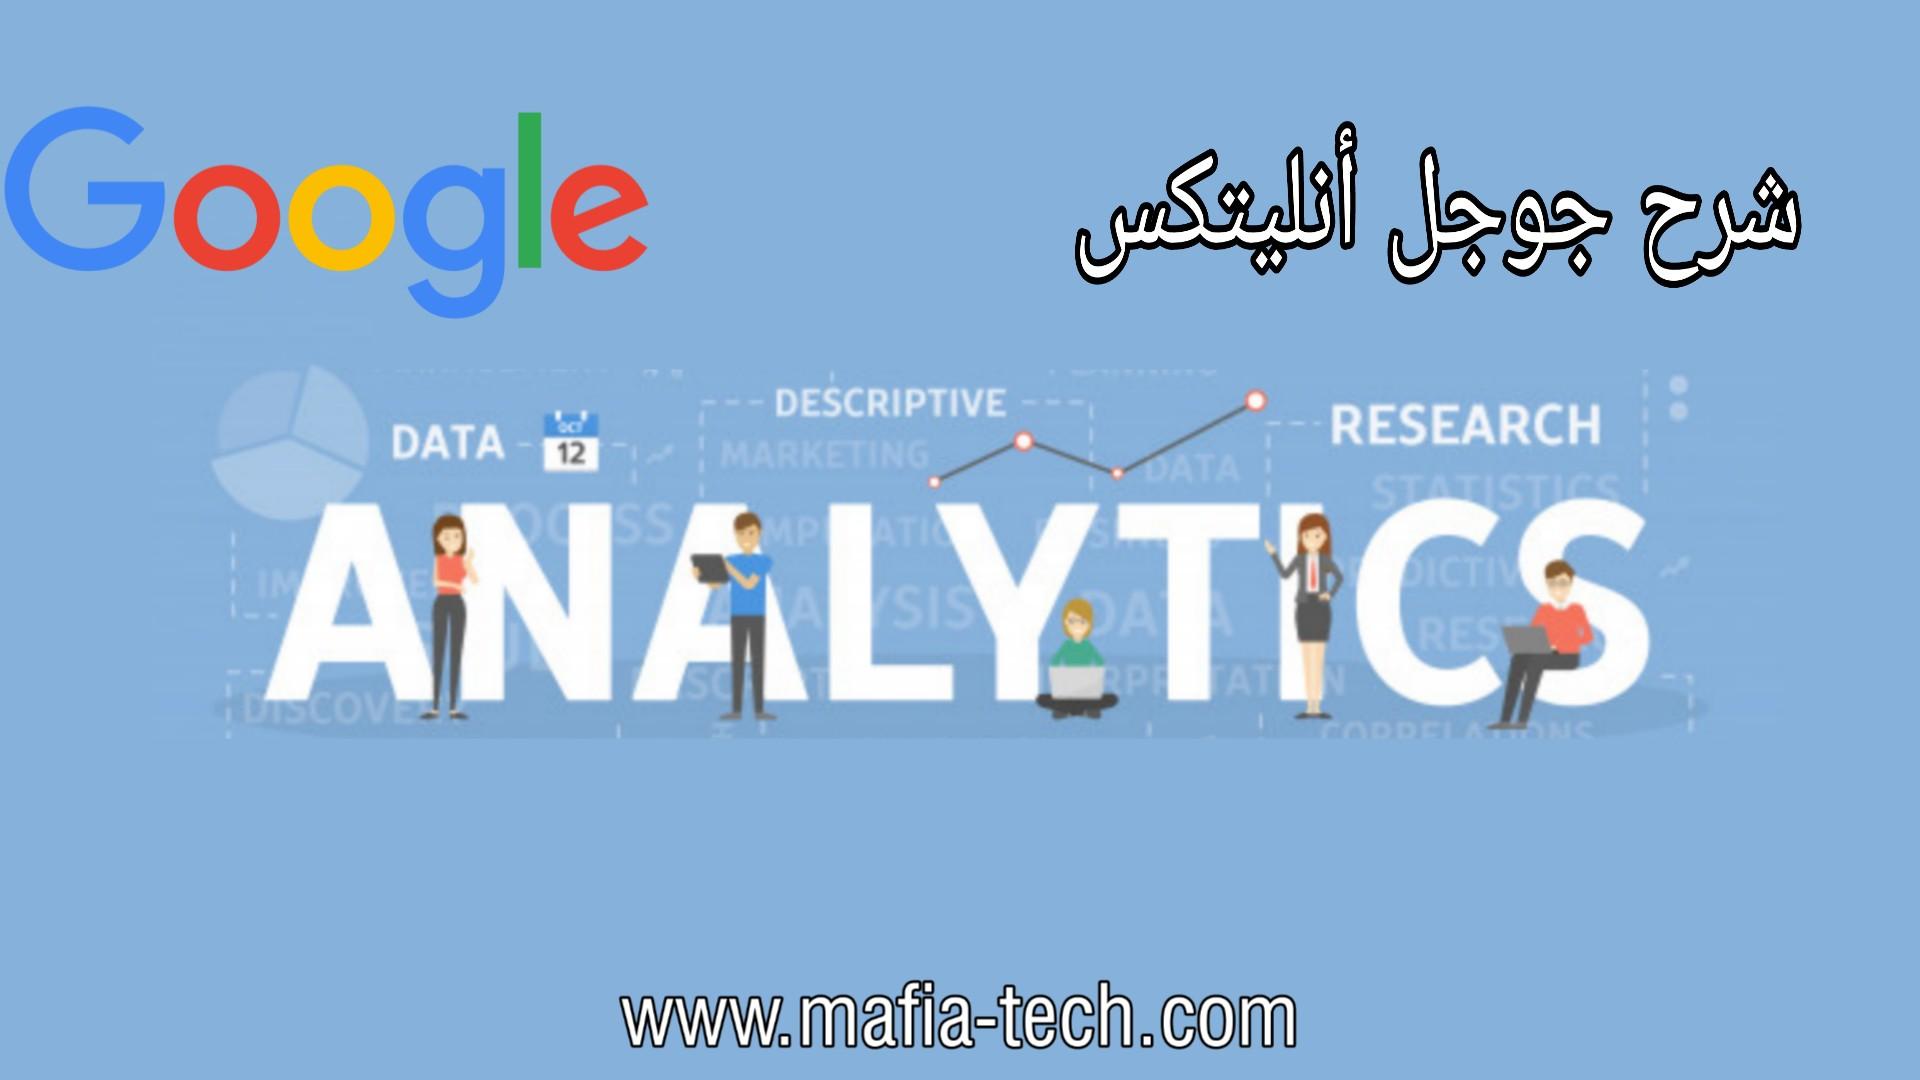 ما هو برنامج Google Analytics؟